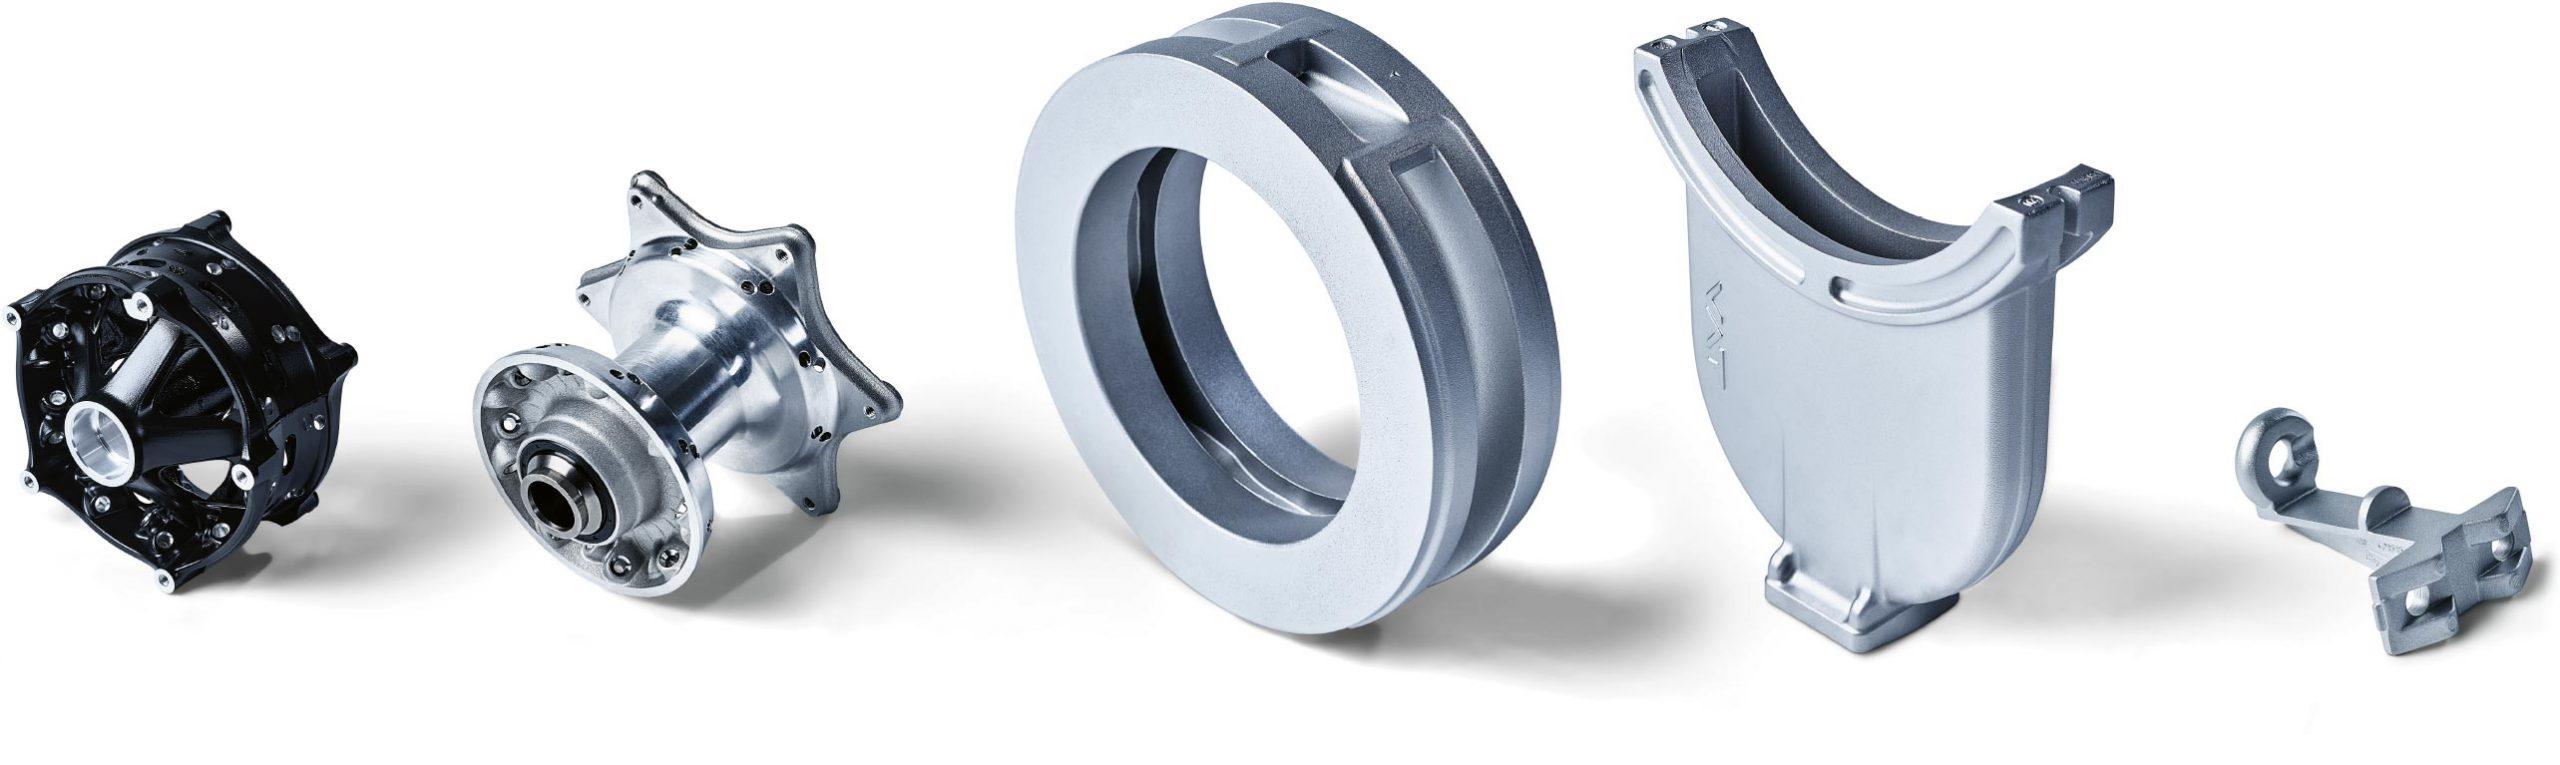 Produktübersicht VMG Metall Aluguss